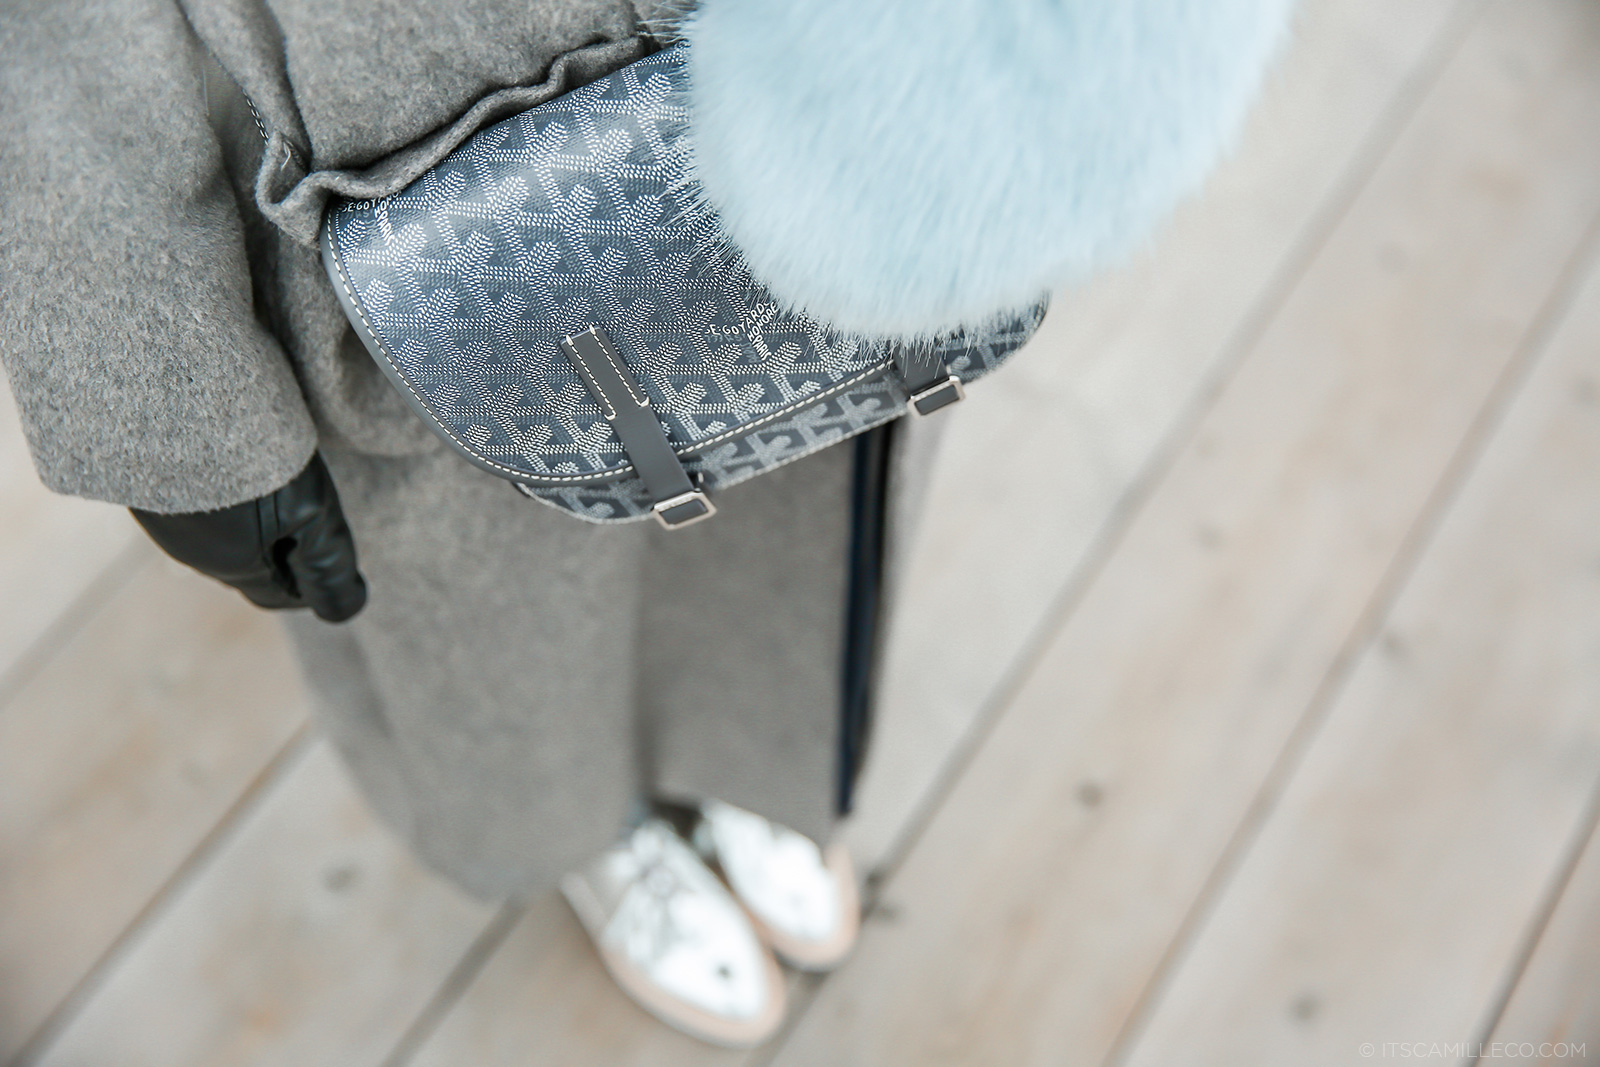 Goyard bag - Camille Co